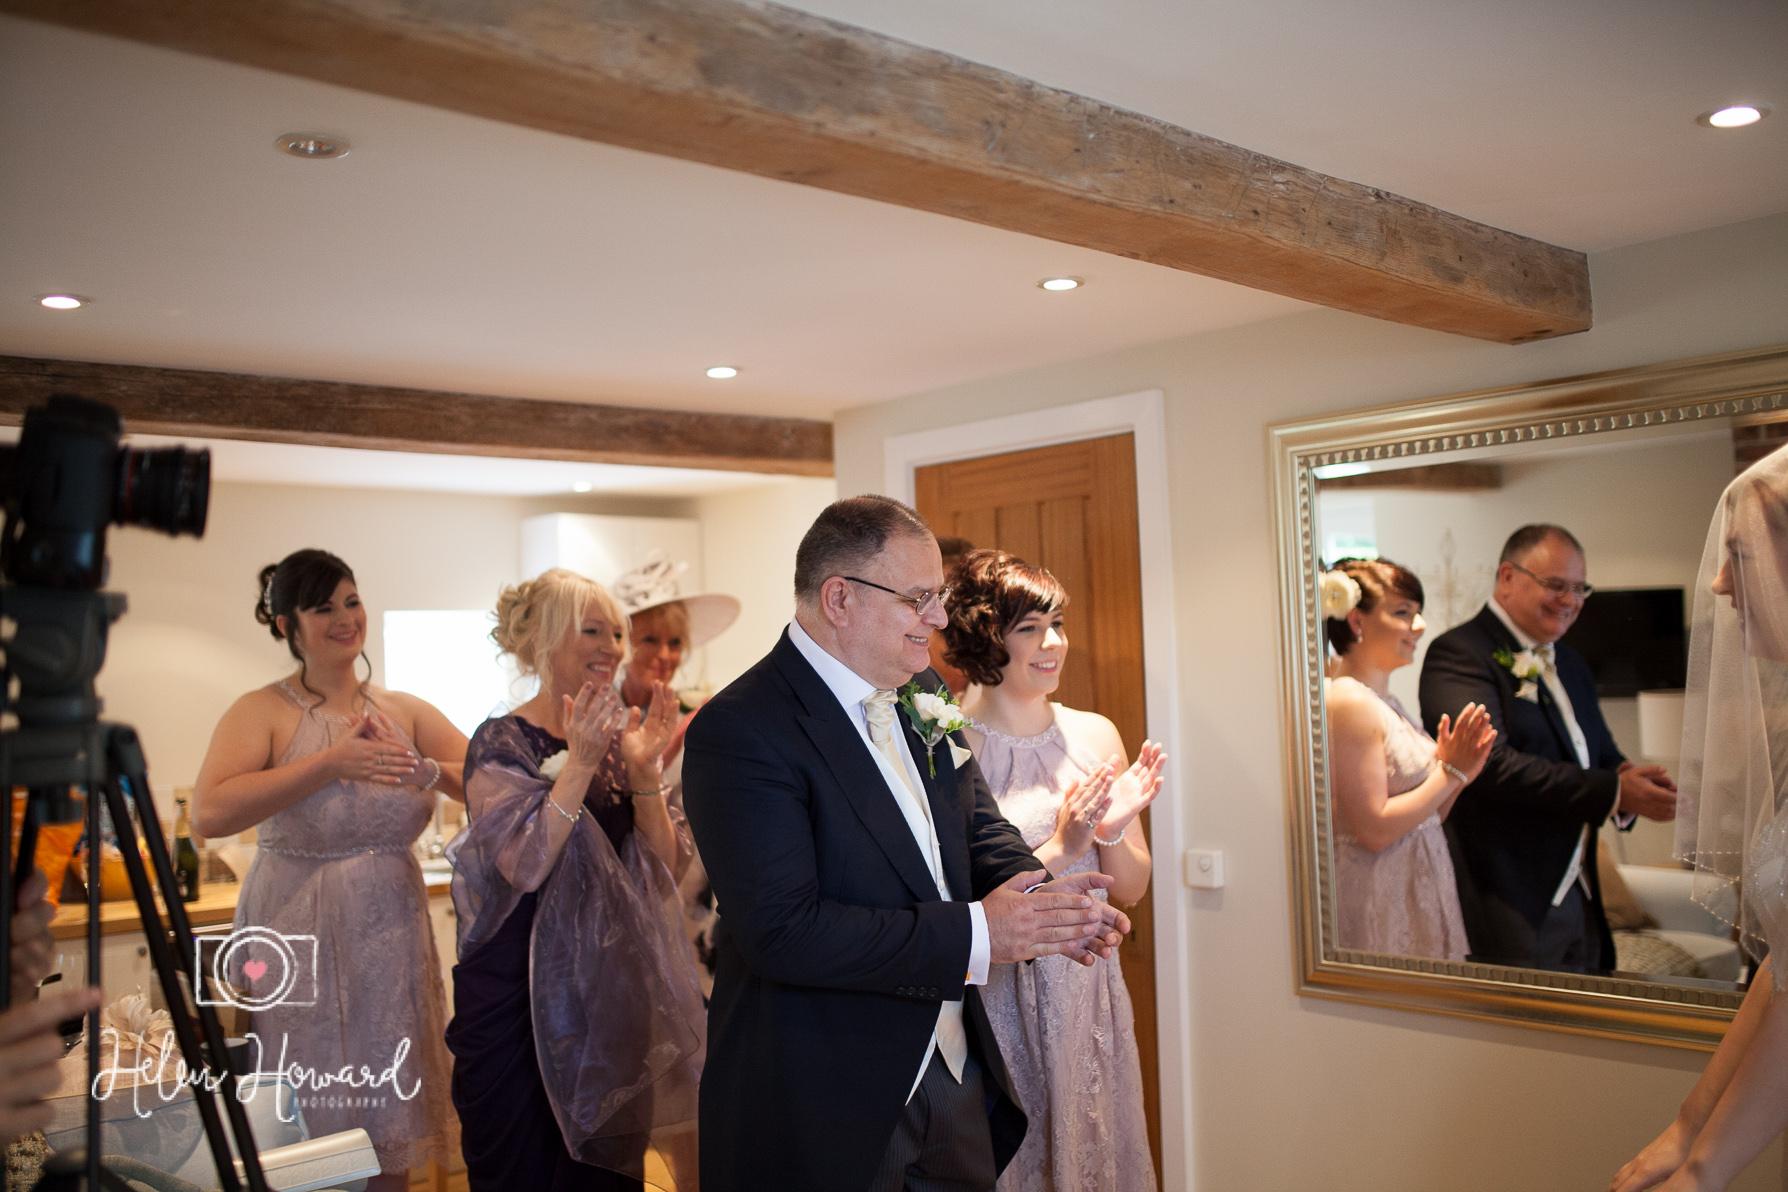 Helen Howard Photography Packington Moor Wedding-51.jpg